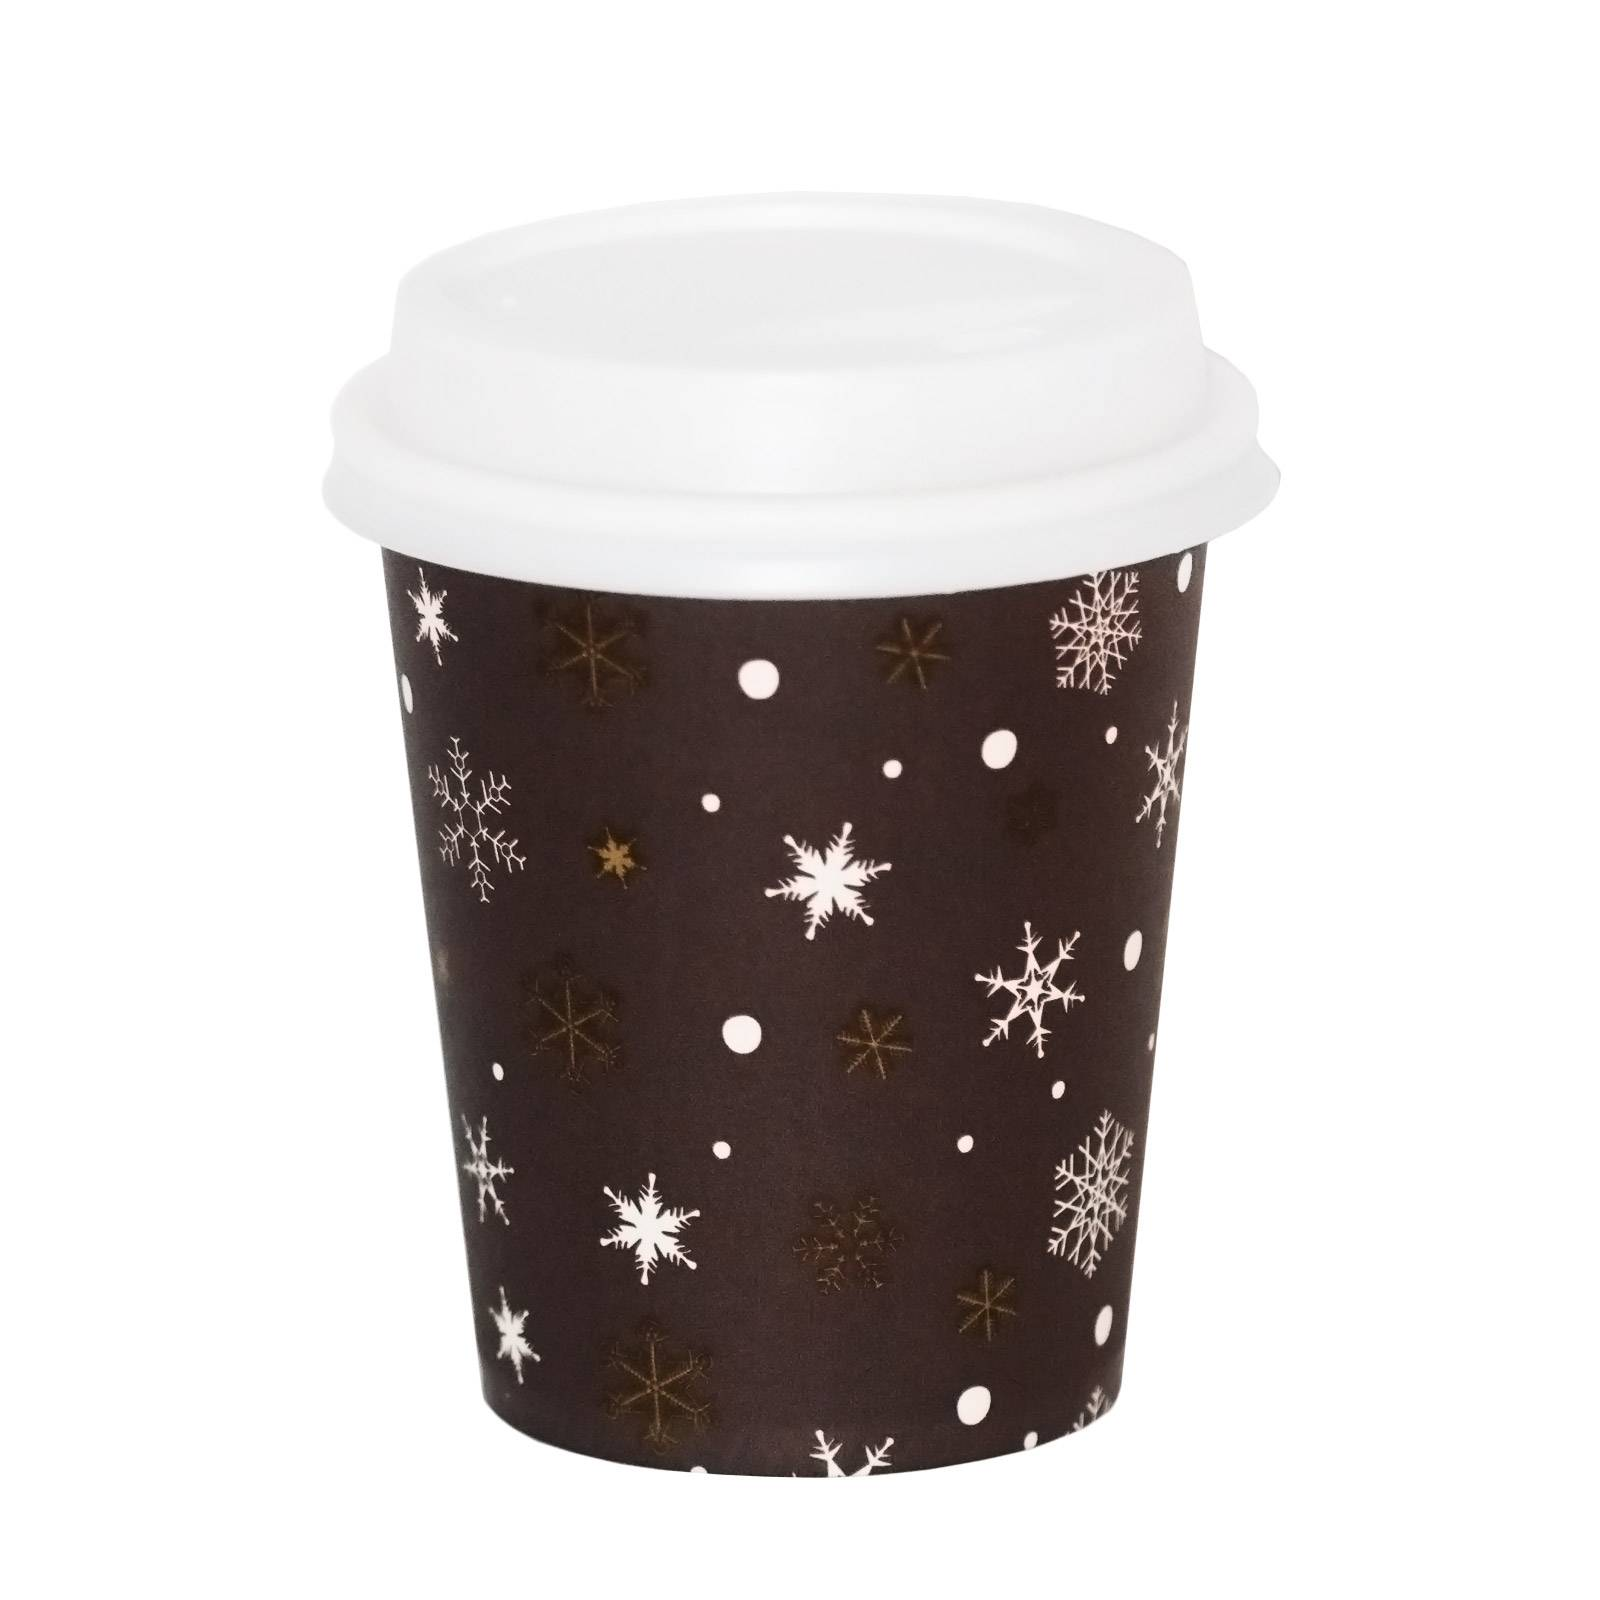 coffee to go becher 0 2l kristall mit deckel weiss 200 stk. Black Bedroom Furniture Sets. Home Design Ideas